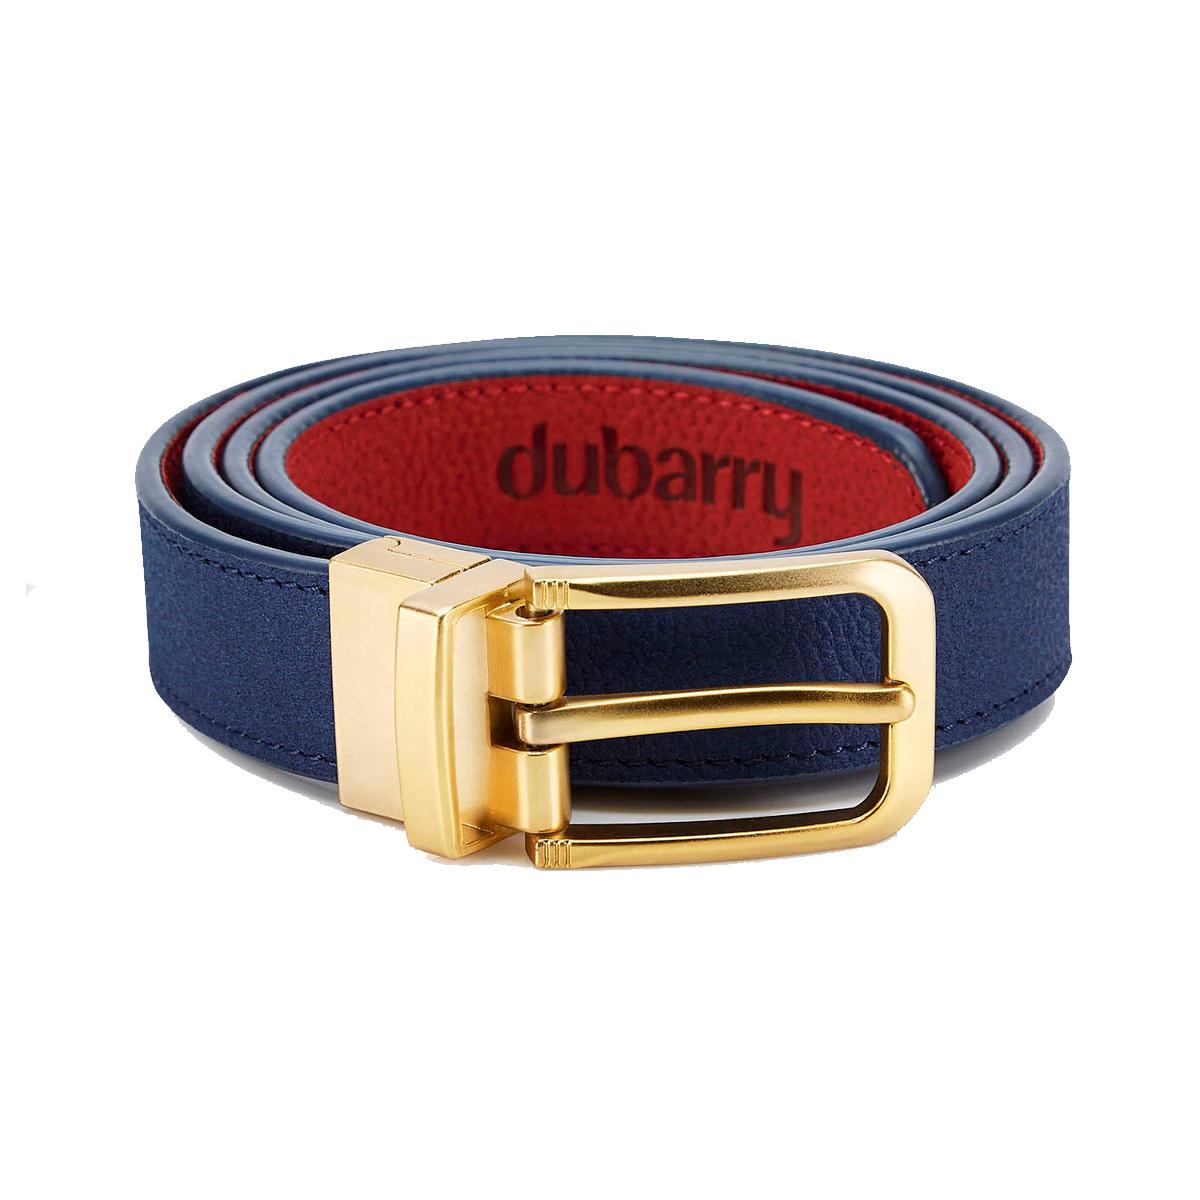 Dubarry-Foynes-Leather-Belt-Royal-Blue-Poppy